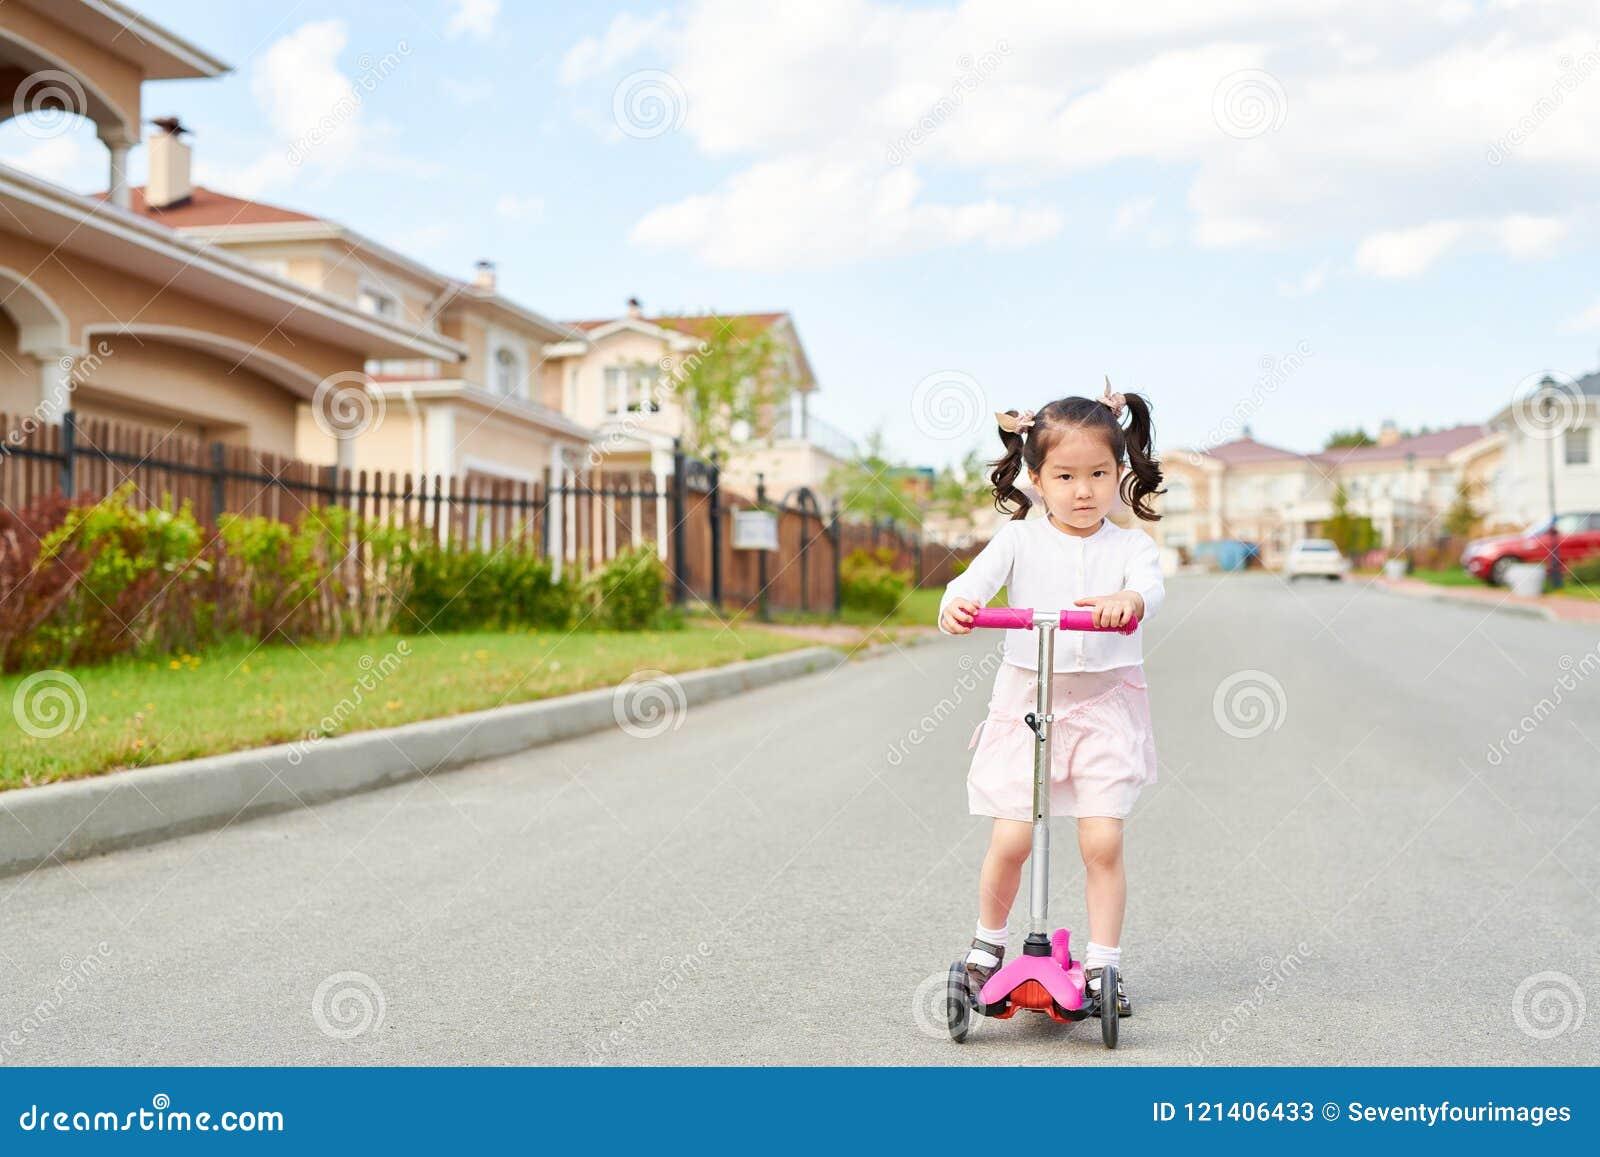 Asian riding camera